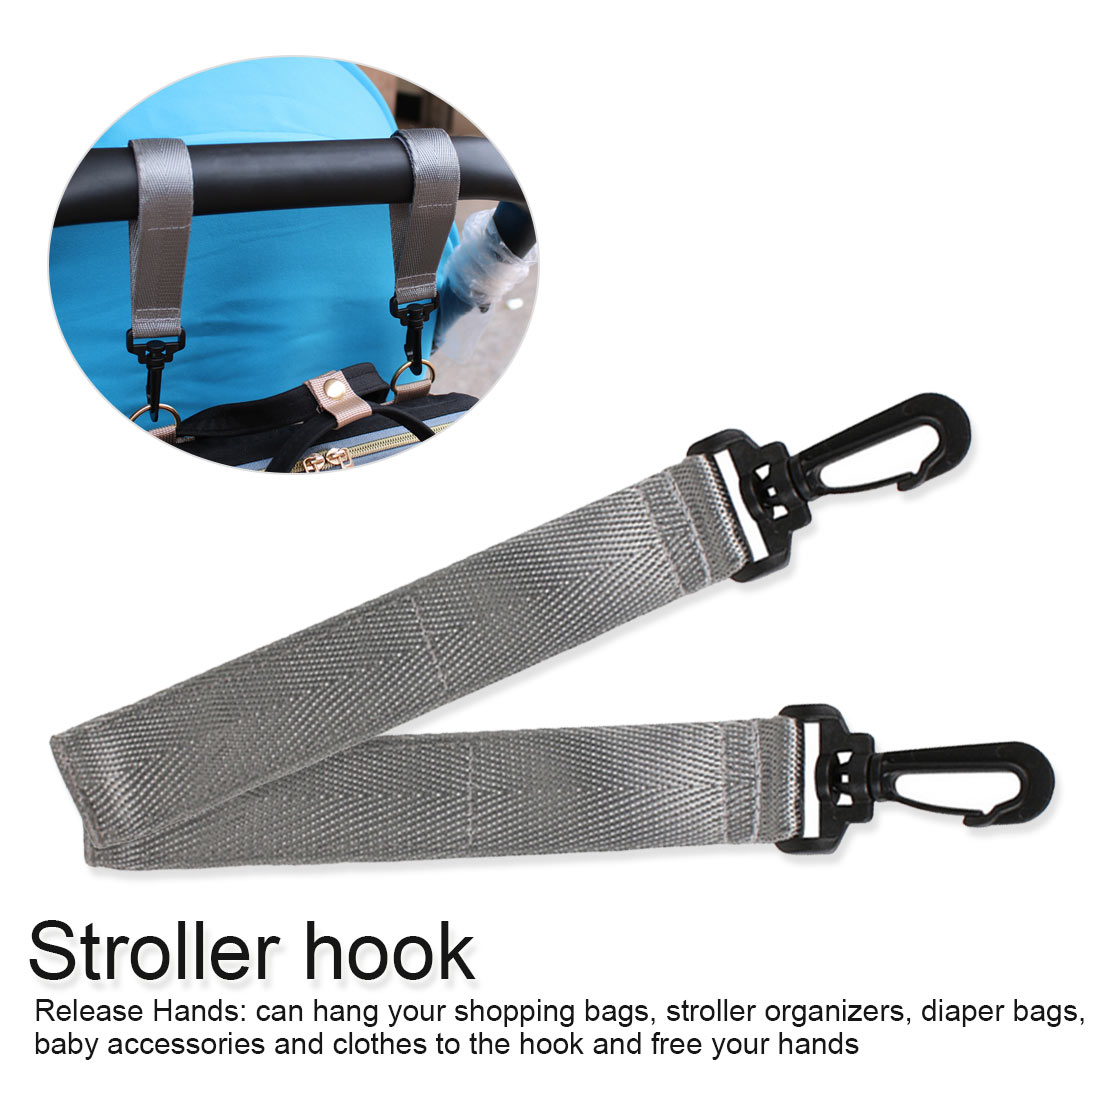 New 2pcs Wheelchair Stroller Hooks Pram Carriage Bag Hanger Hook Baby Strollers Shopping Clip Accessories